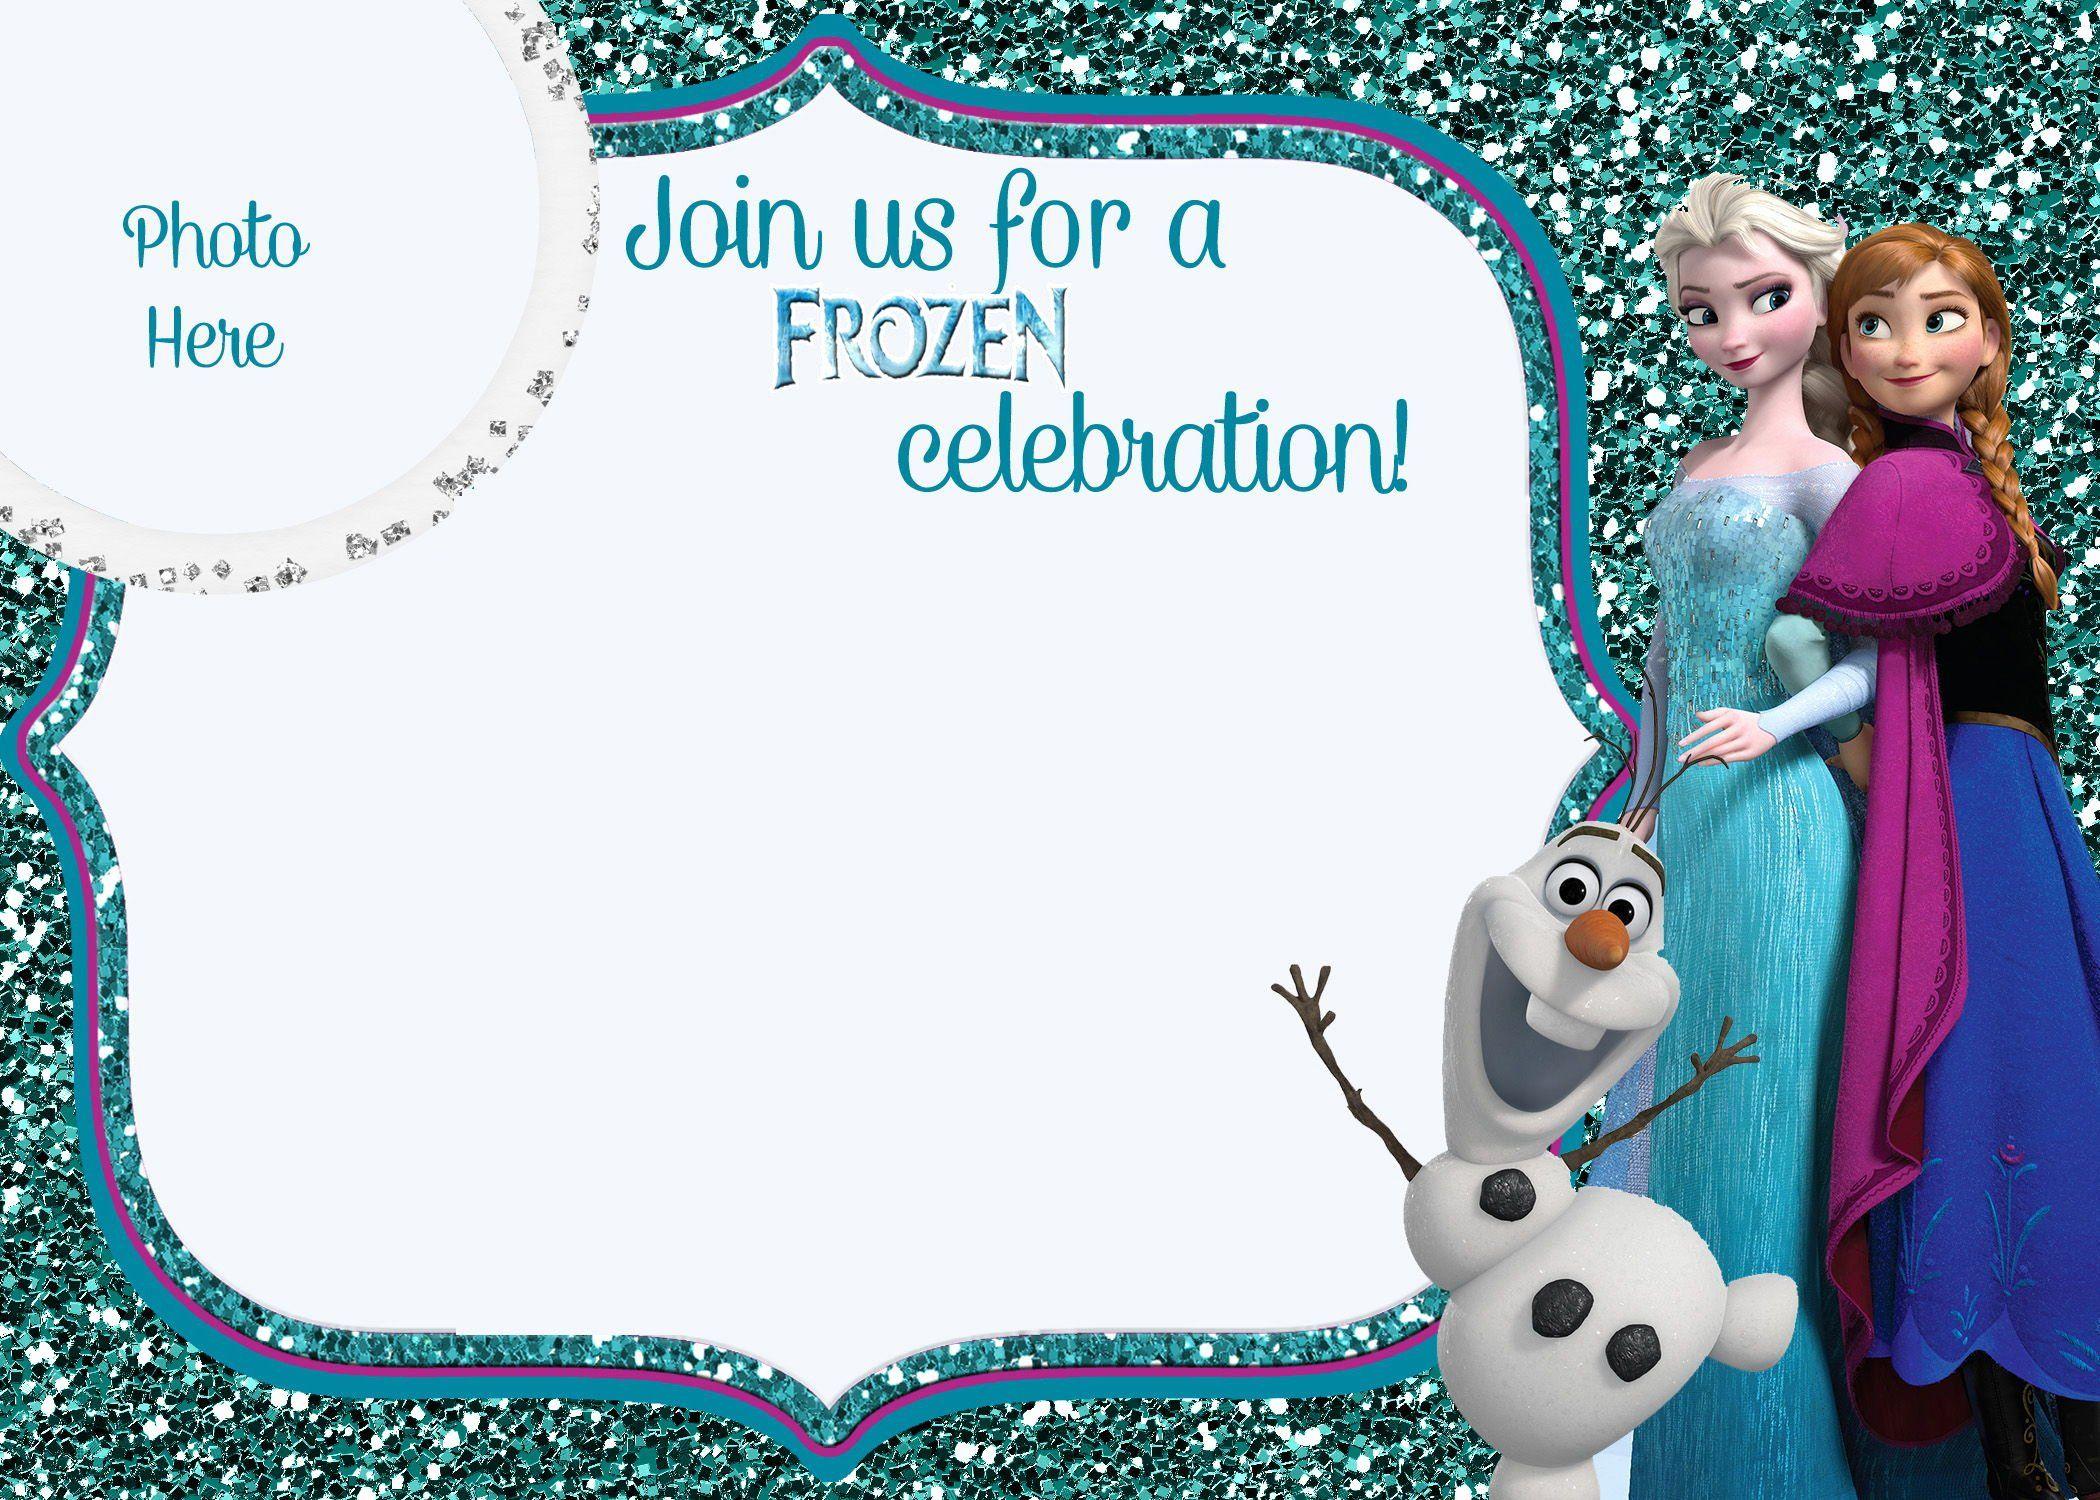 Frozen Birthday Party Invitation Inspirational Free Printable Frozen M Frozen Birthday Invitations Frozen Birthday Party Invites Printable Birthday Invitations